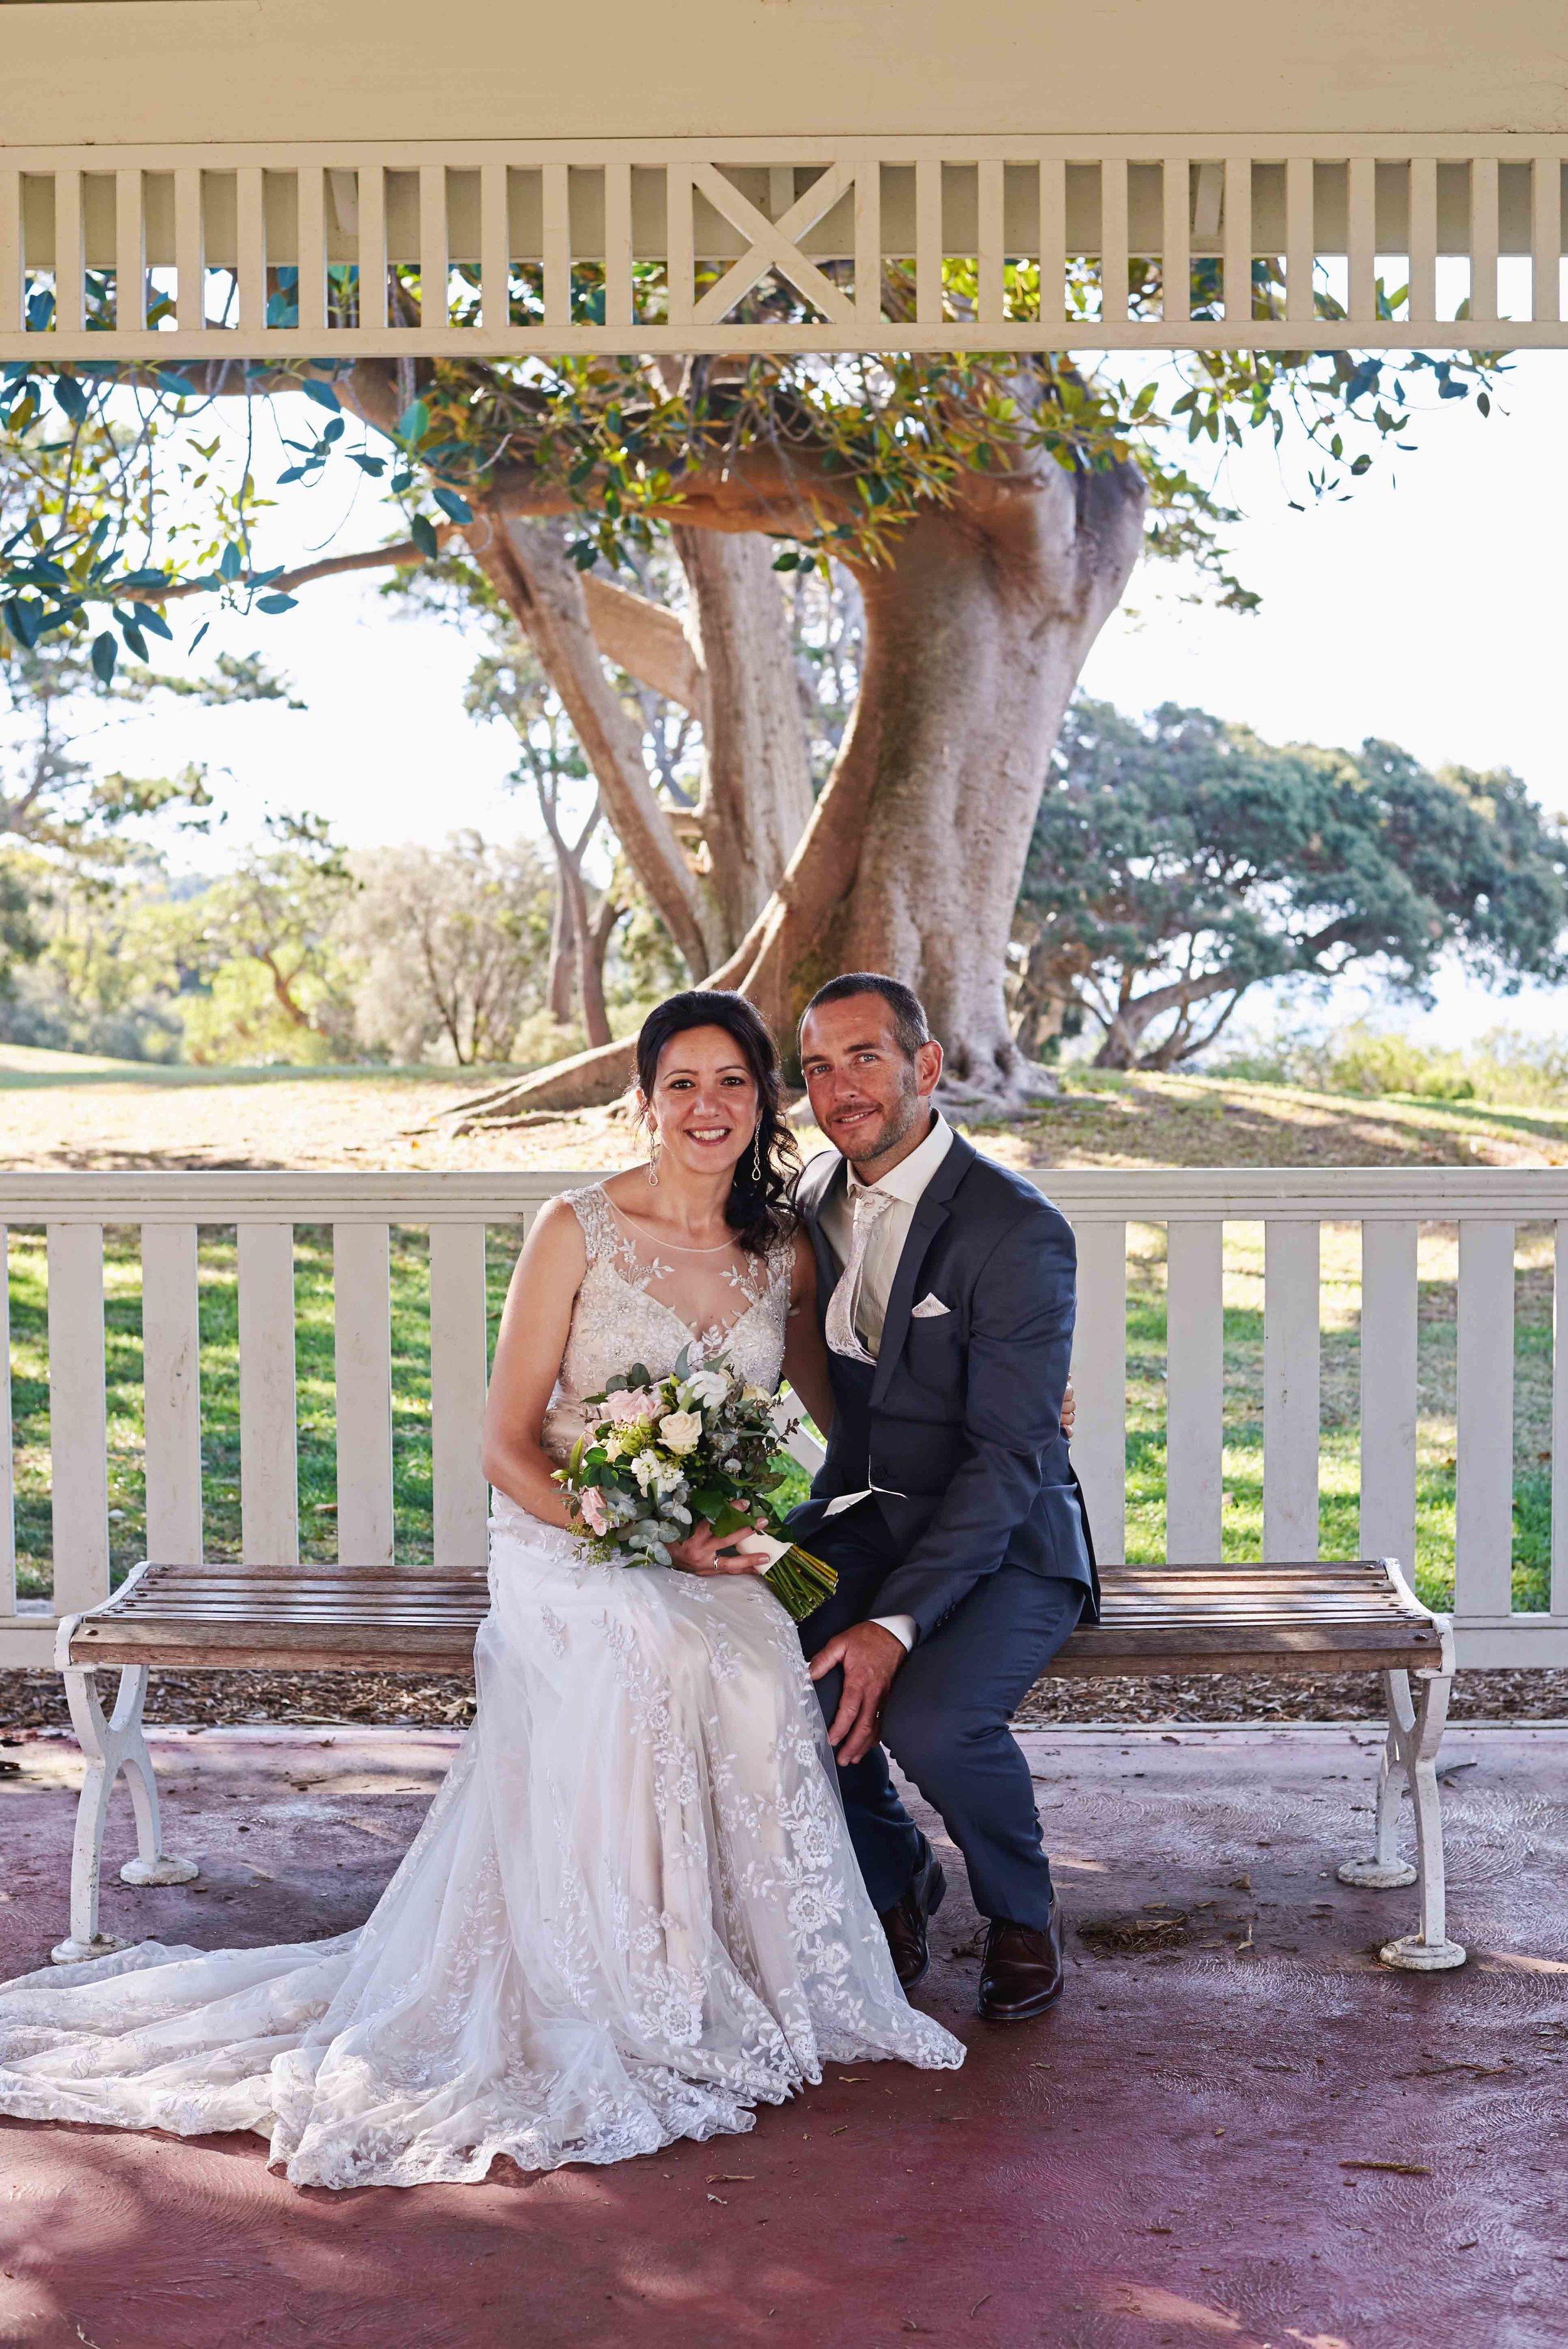 sorrento-wedding-photography-all-smiles-marissa-jade-photography-152.jpg